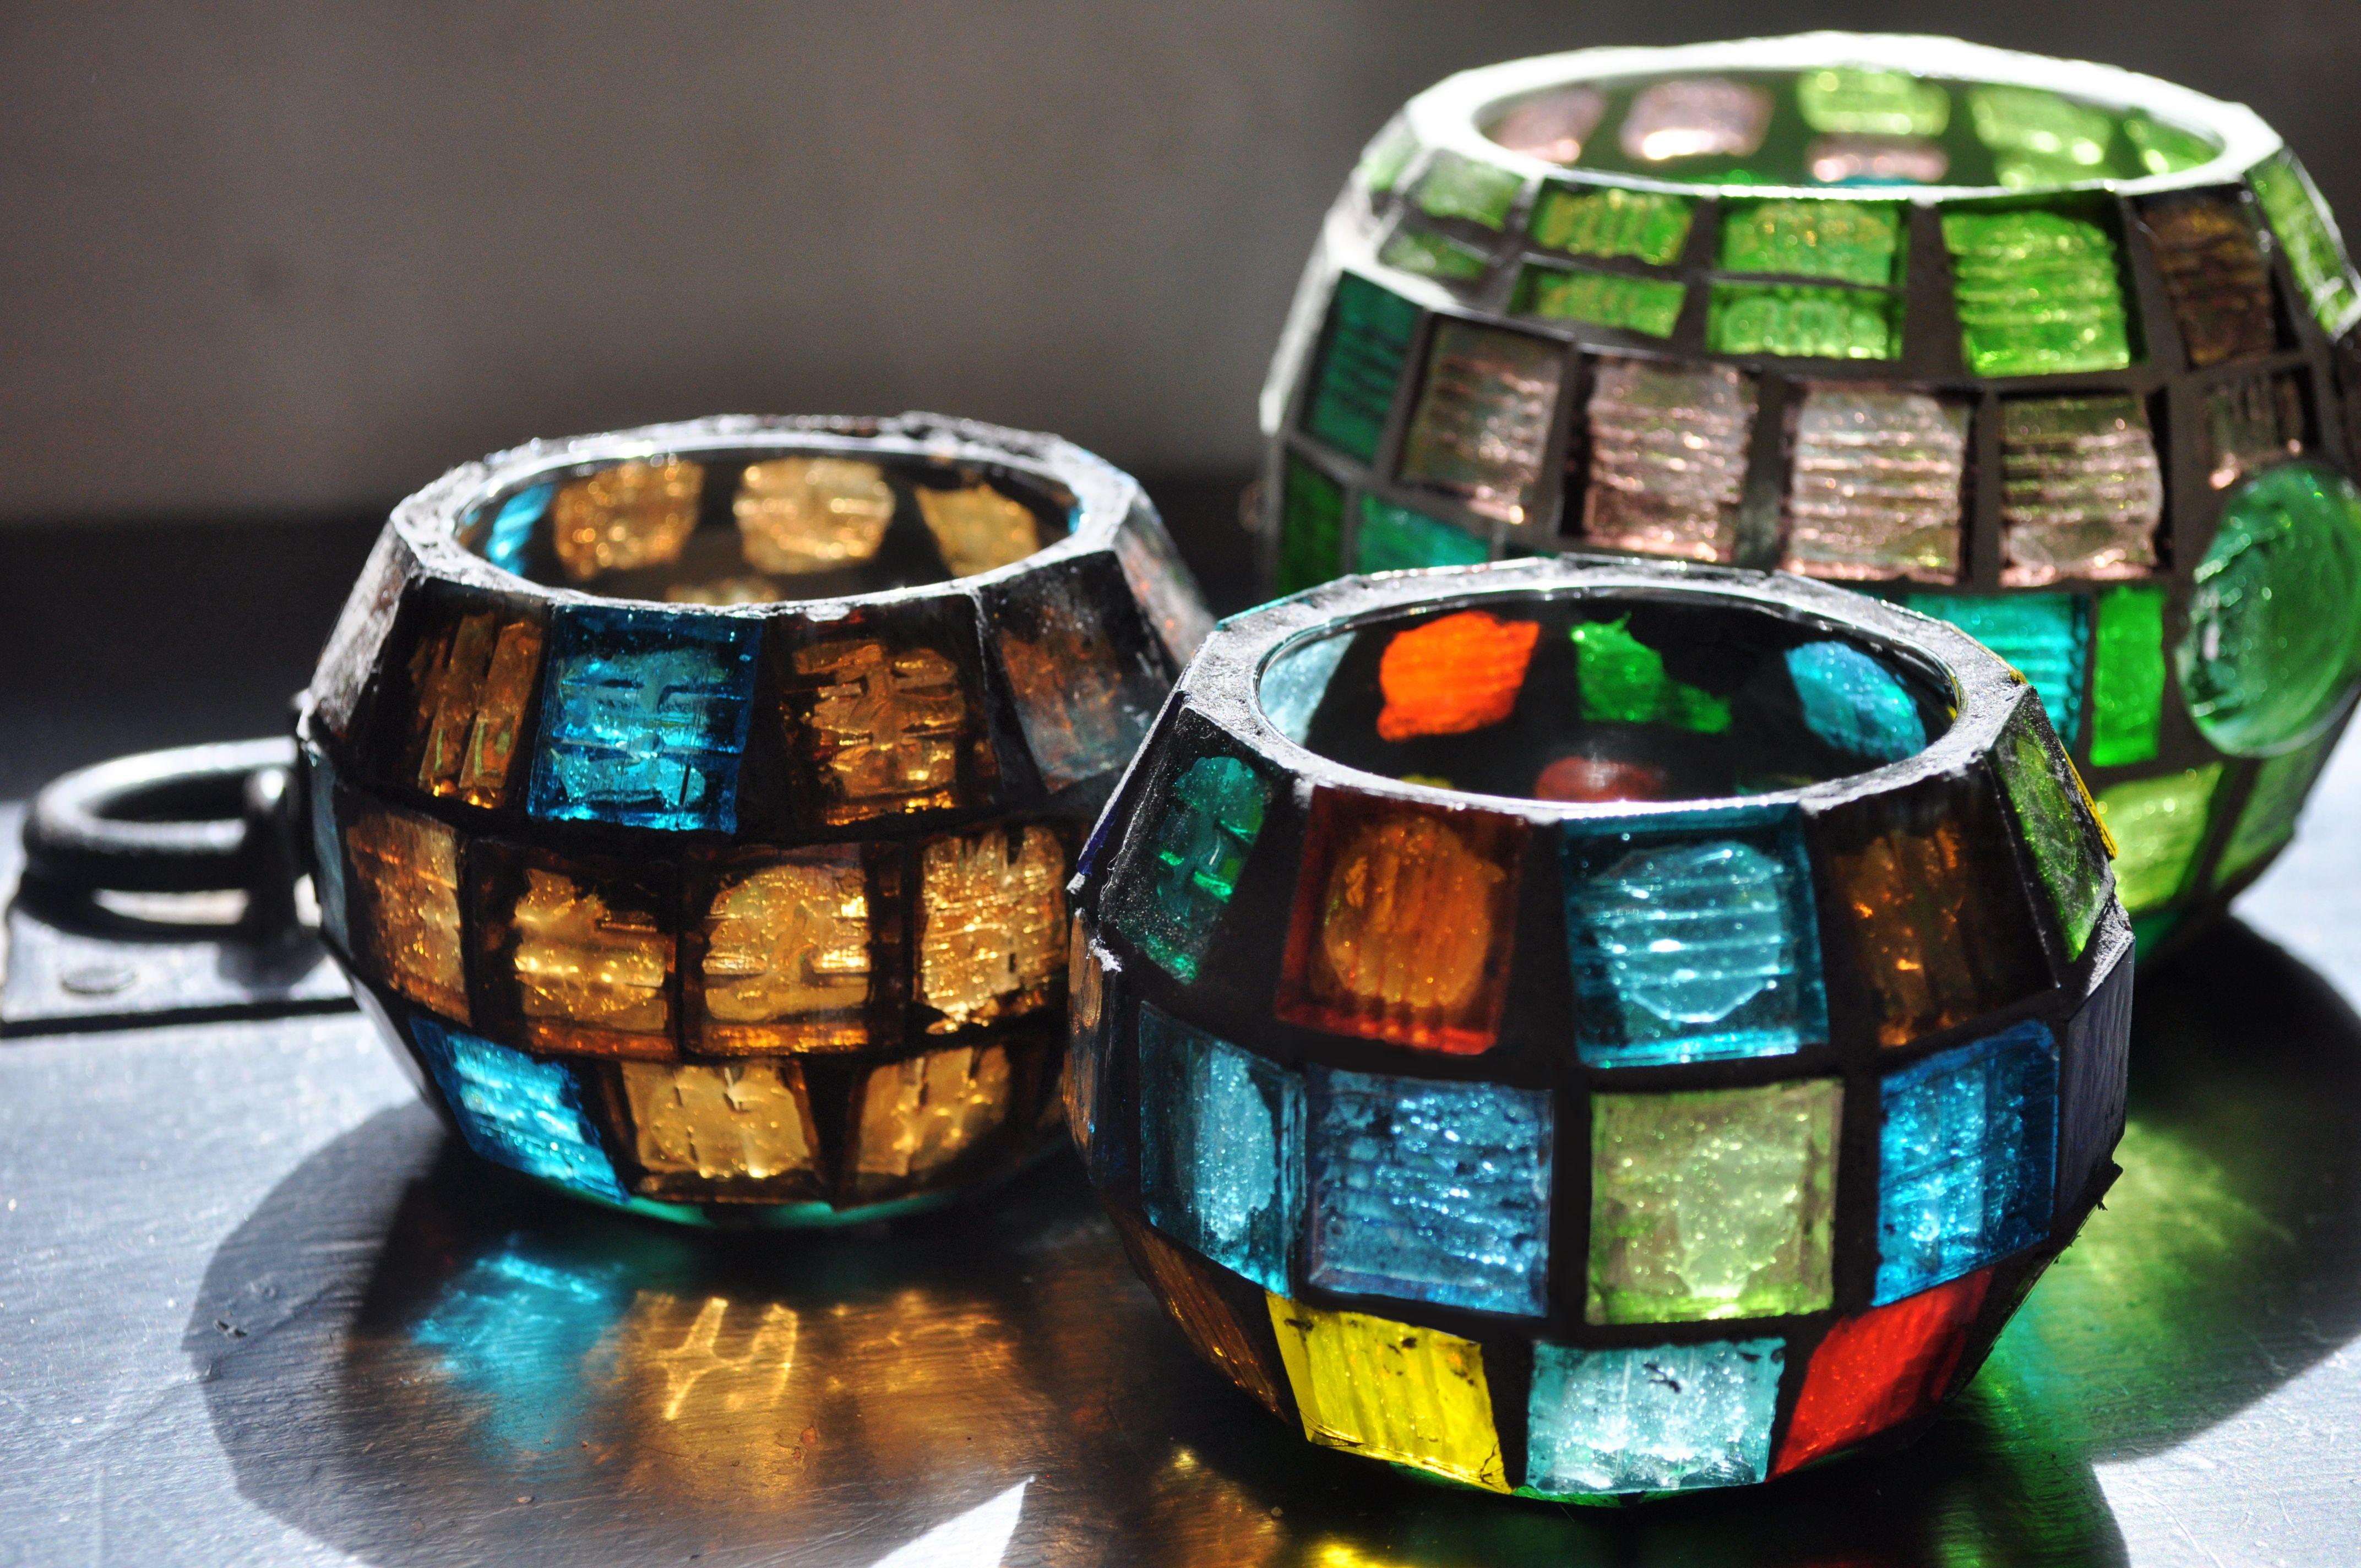 Mosaic Glass Lanterns Fanales De Vidrio Mosaiqueado #Mosaic #Mosaiquismo #Venecitas